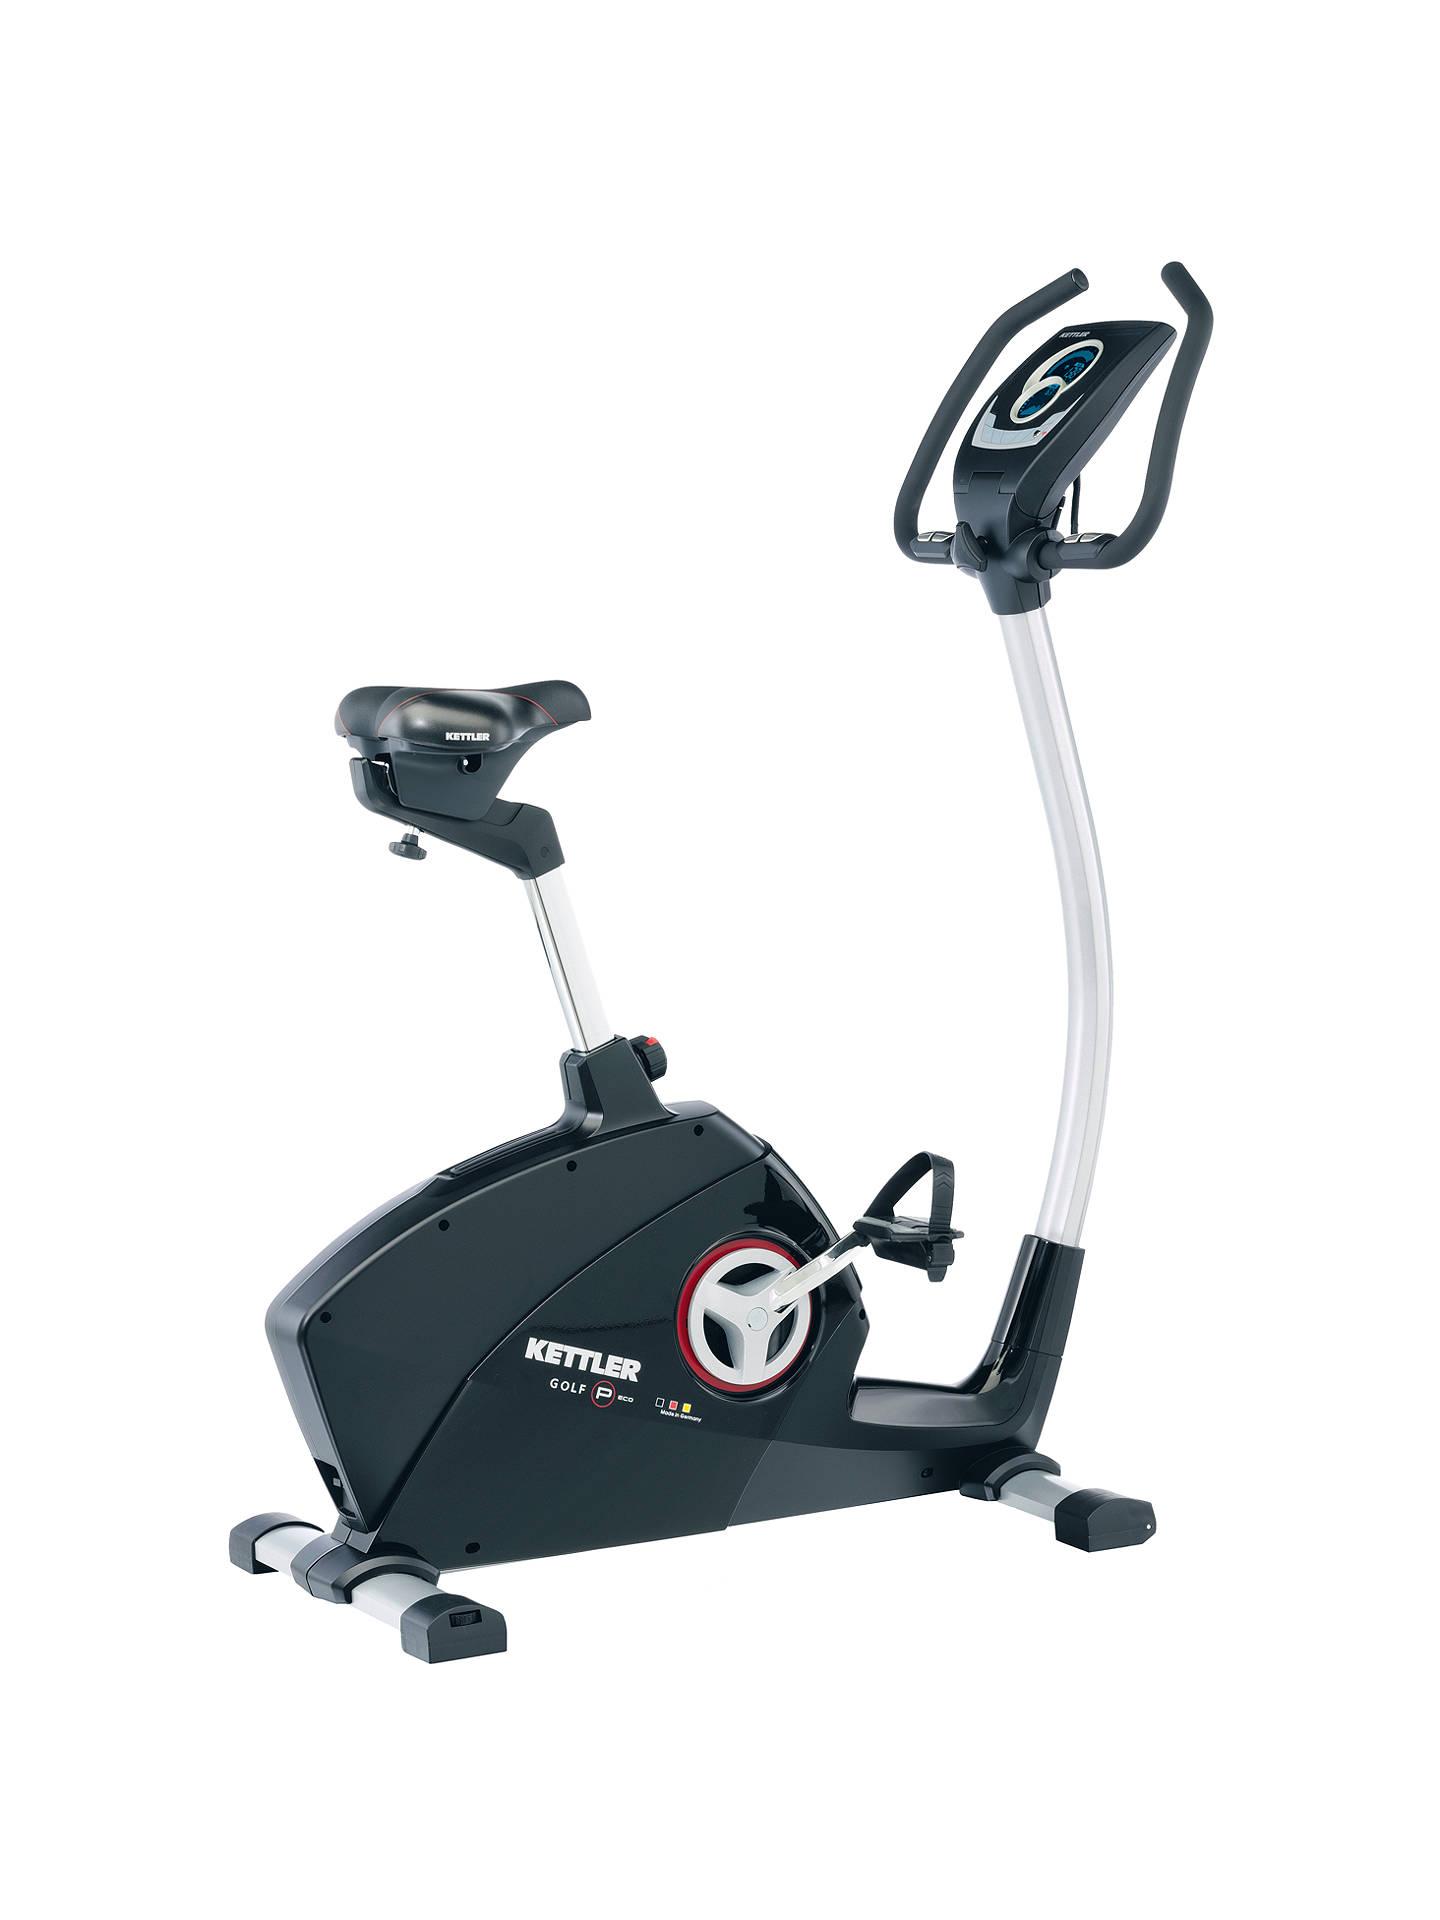 BuyKETTLER Golf Deluxe Upright Exercise Bike Online at johnlewis.com ...